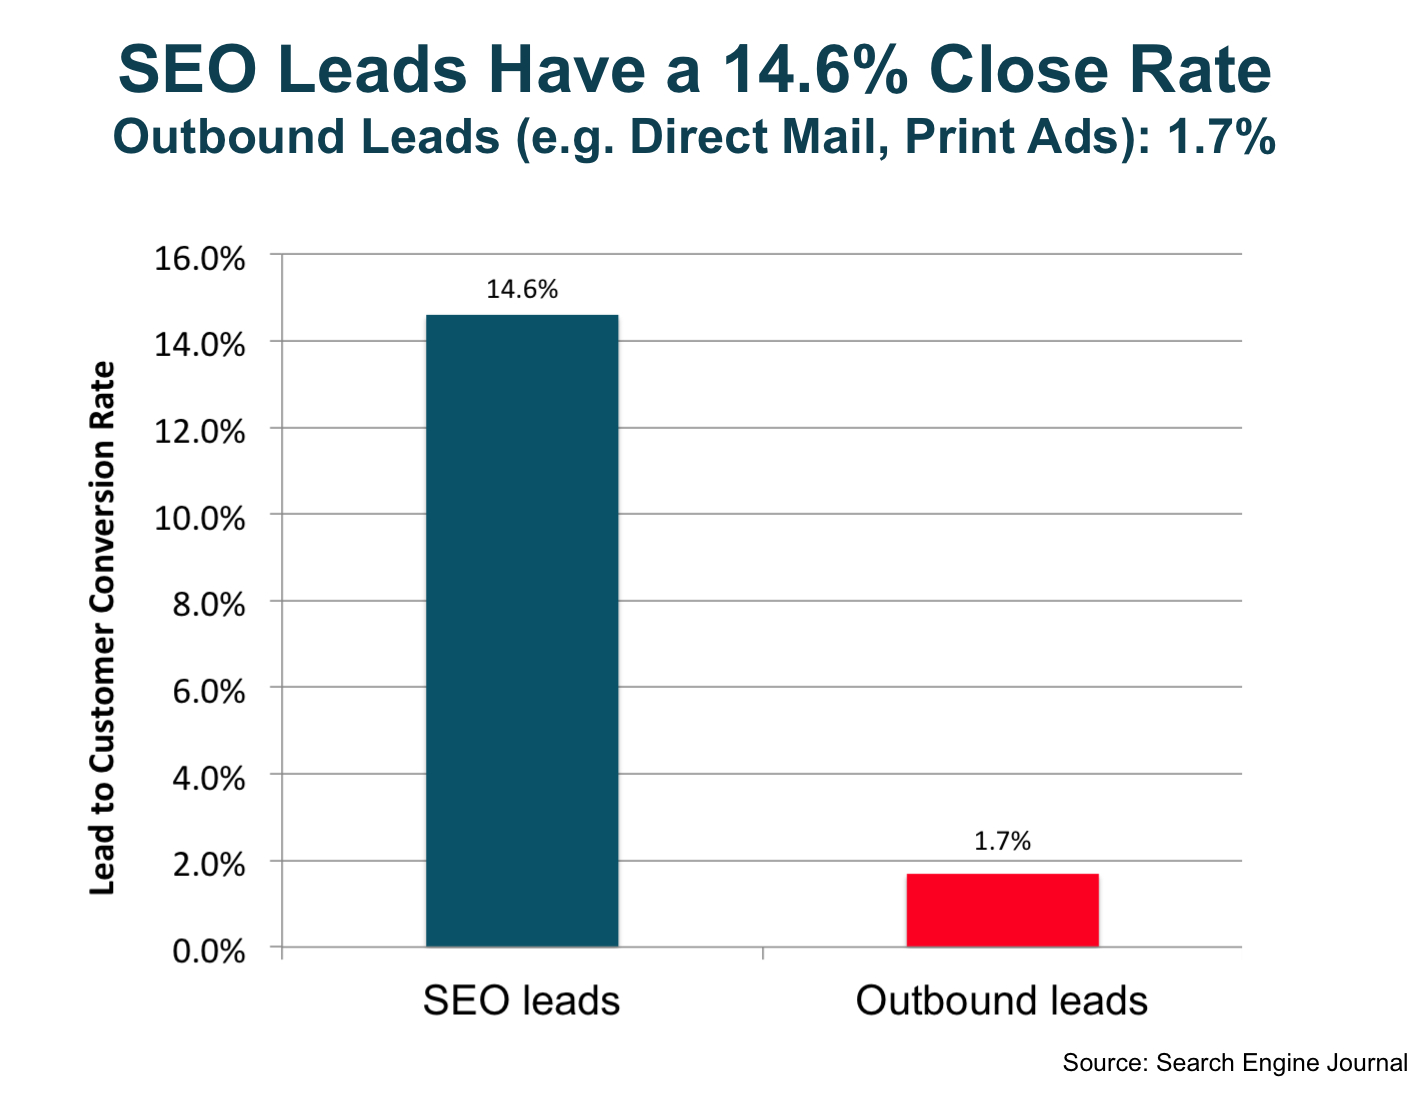 seo_leads_have_a_14.6_percent_close_rate